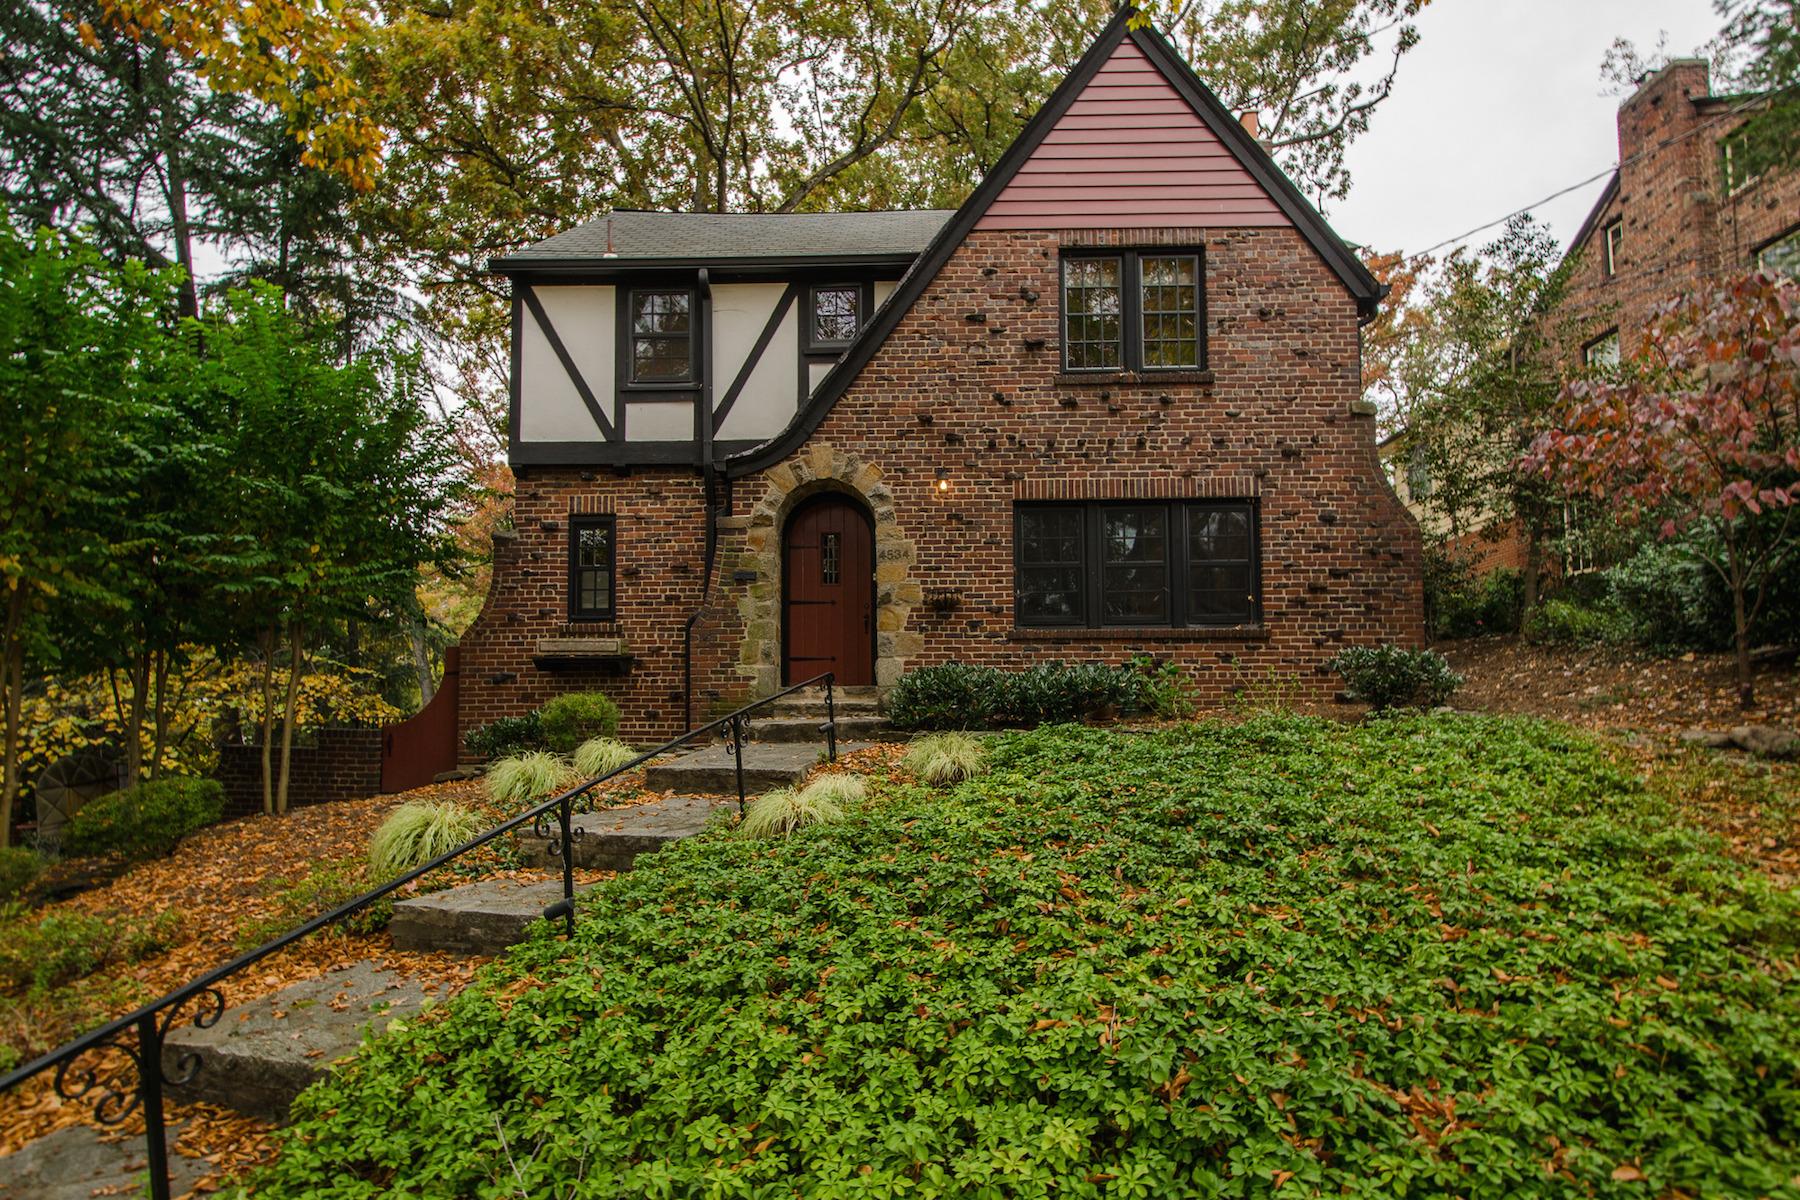 独户住宅 为 销售 在 4534 29th Street NW, Wasington 4534 NW 29th St Forest Hills, Washington, 哥伦比亚特区 20008 美国